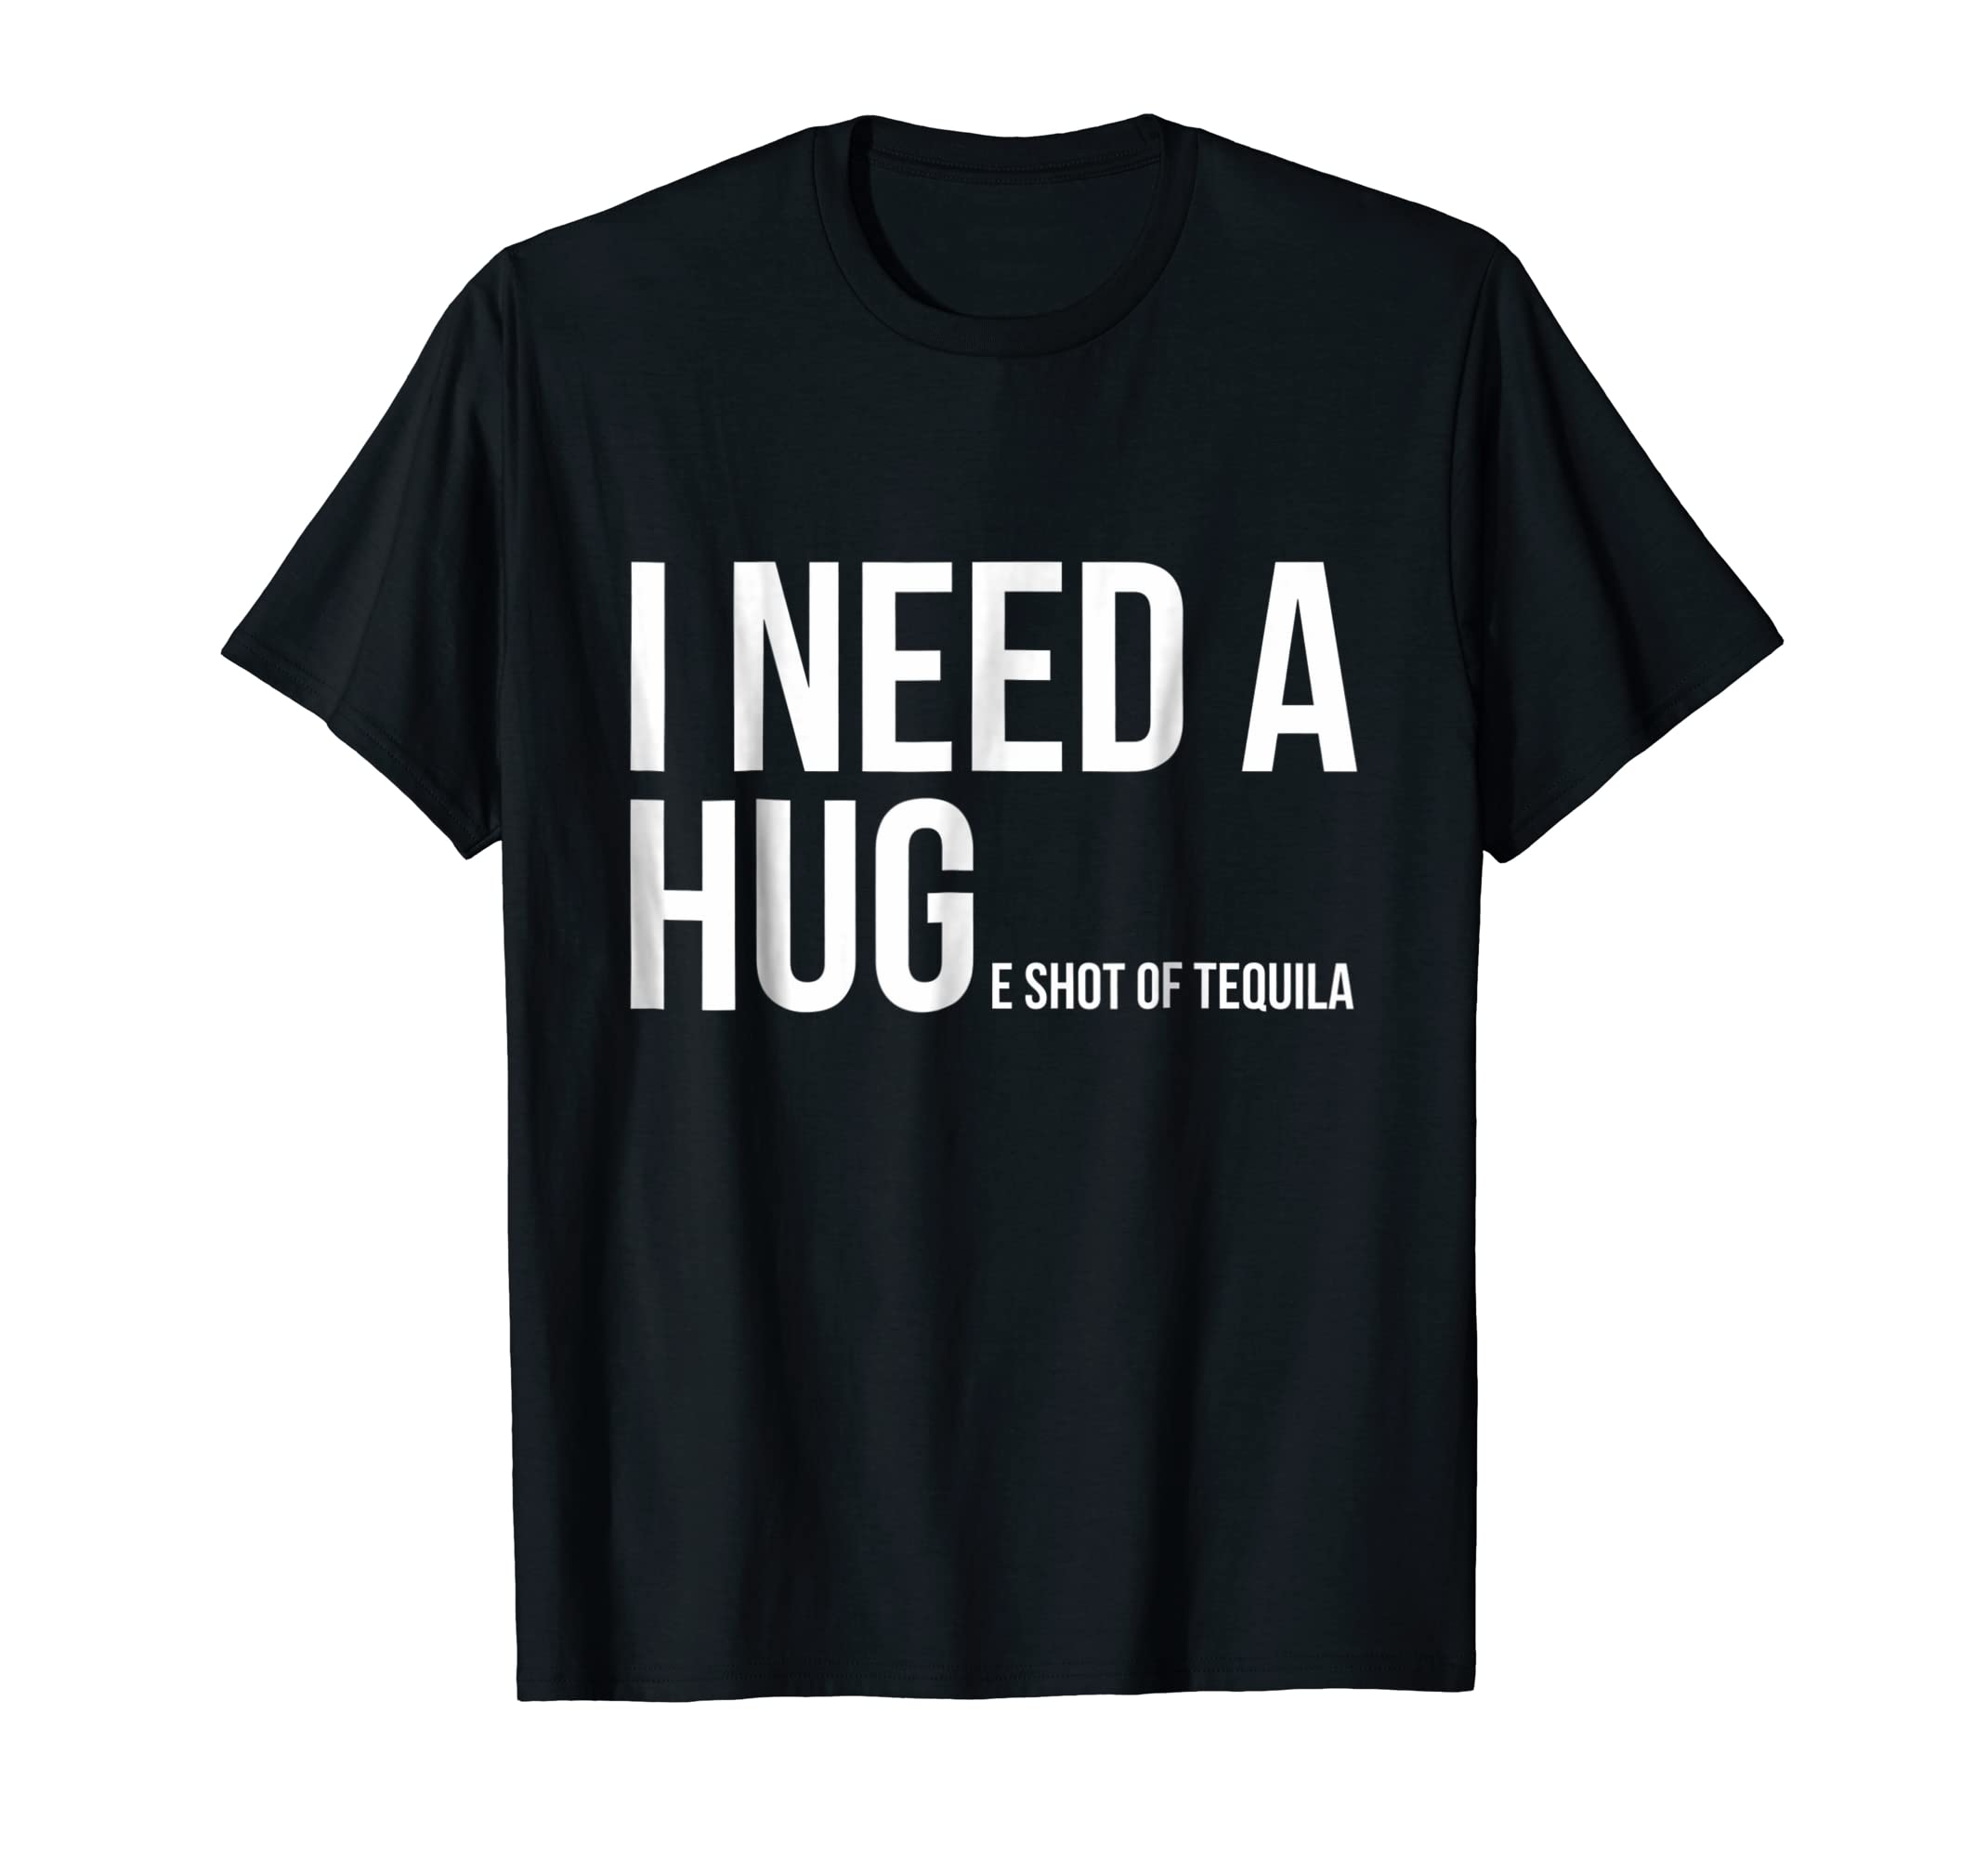 a36632ae1 Amazon.com: I Need A Huge Shot Of Tequila Por Favor T-Shirt: Clothing